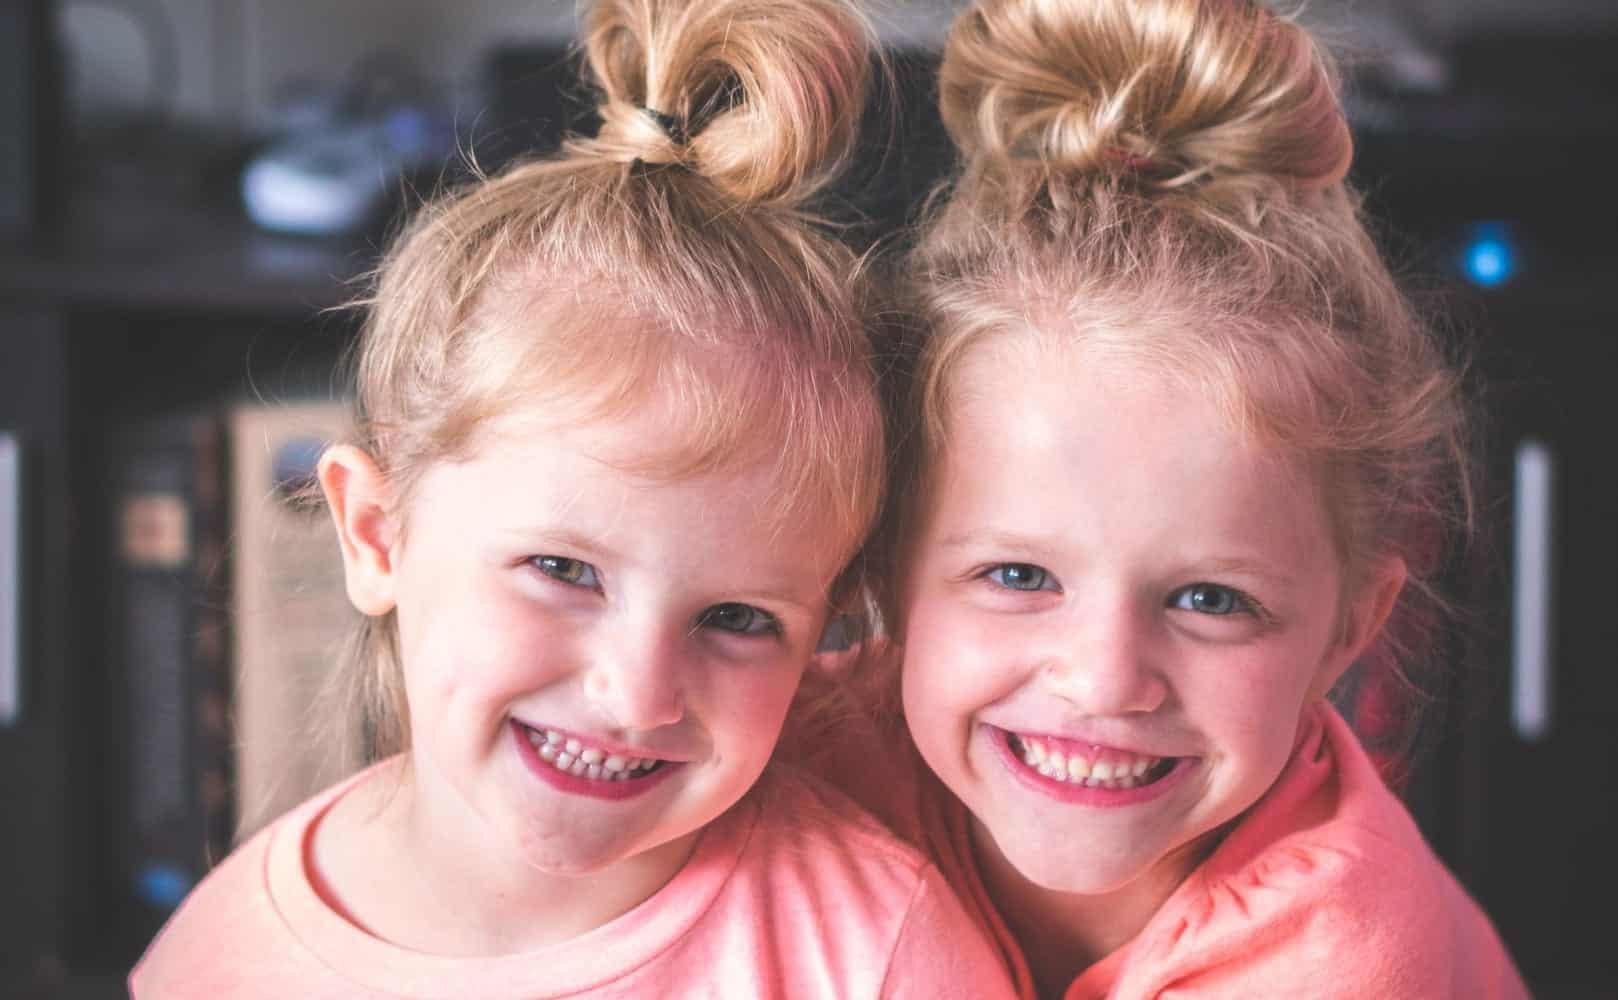 child custody thumb Torrone Law